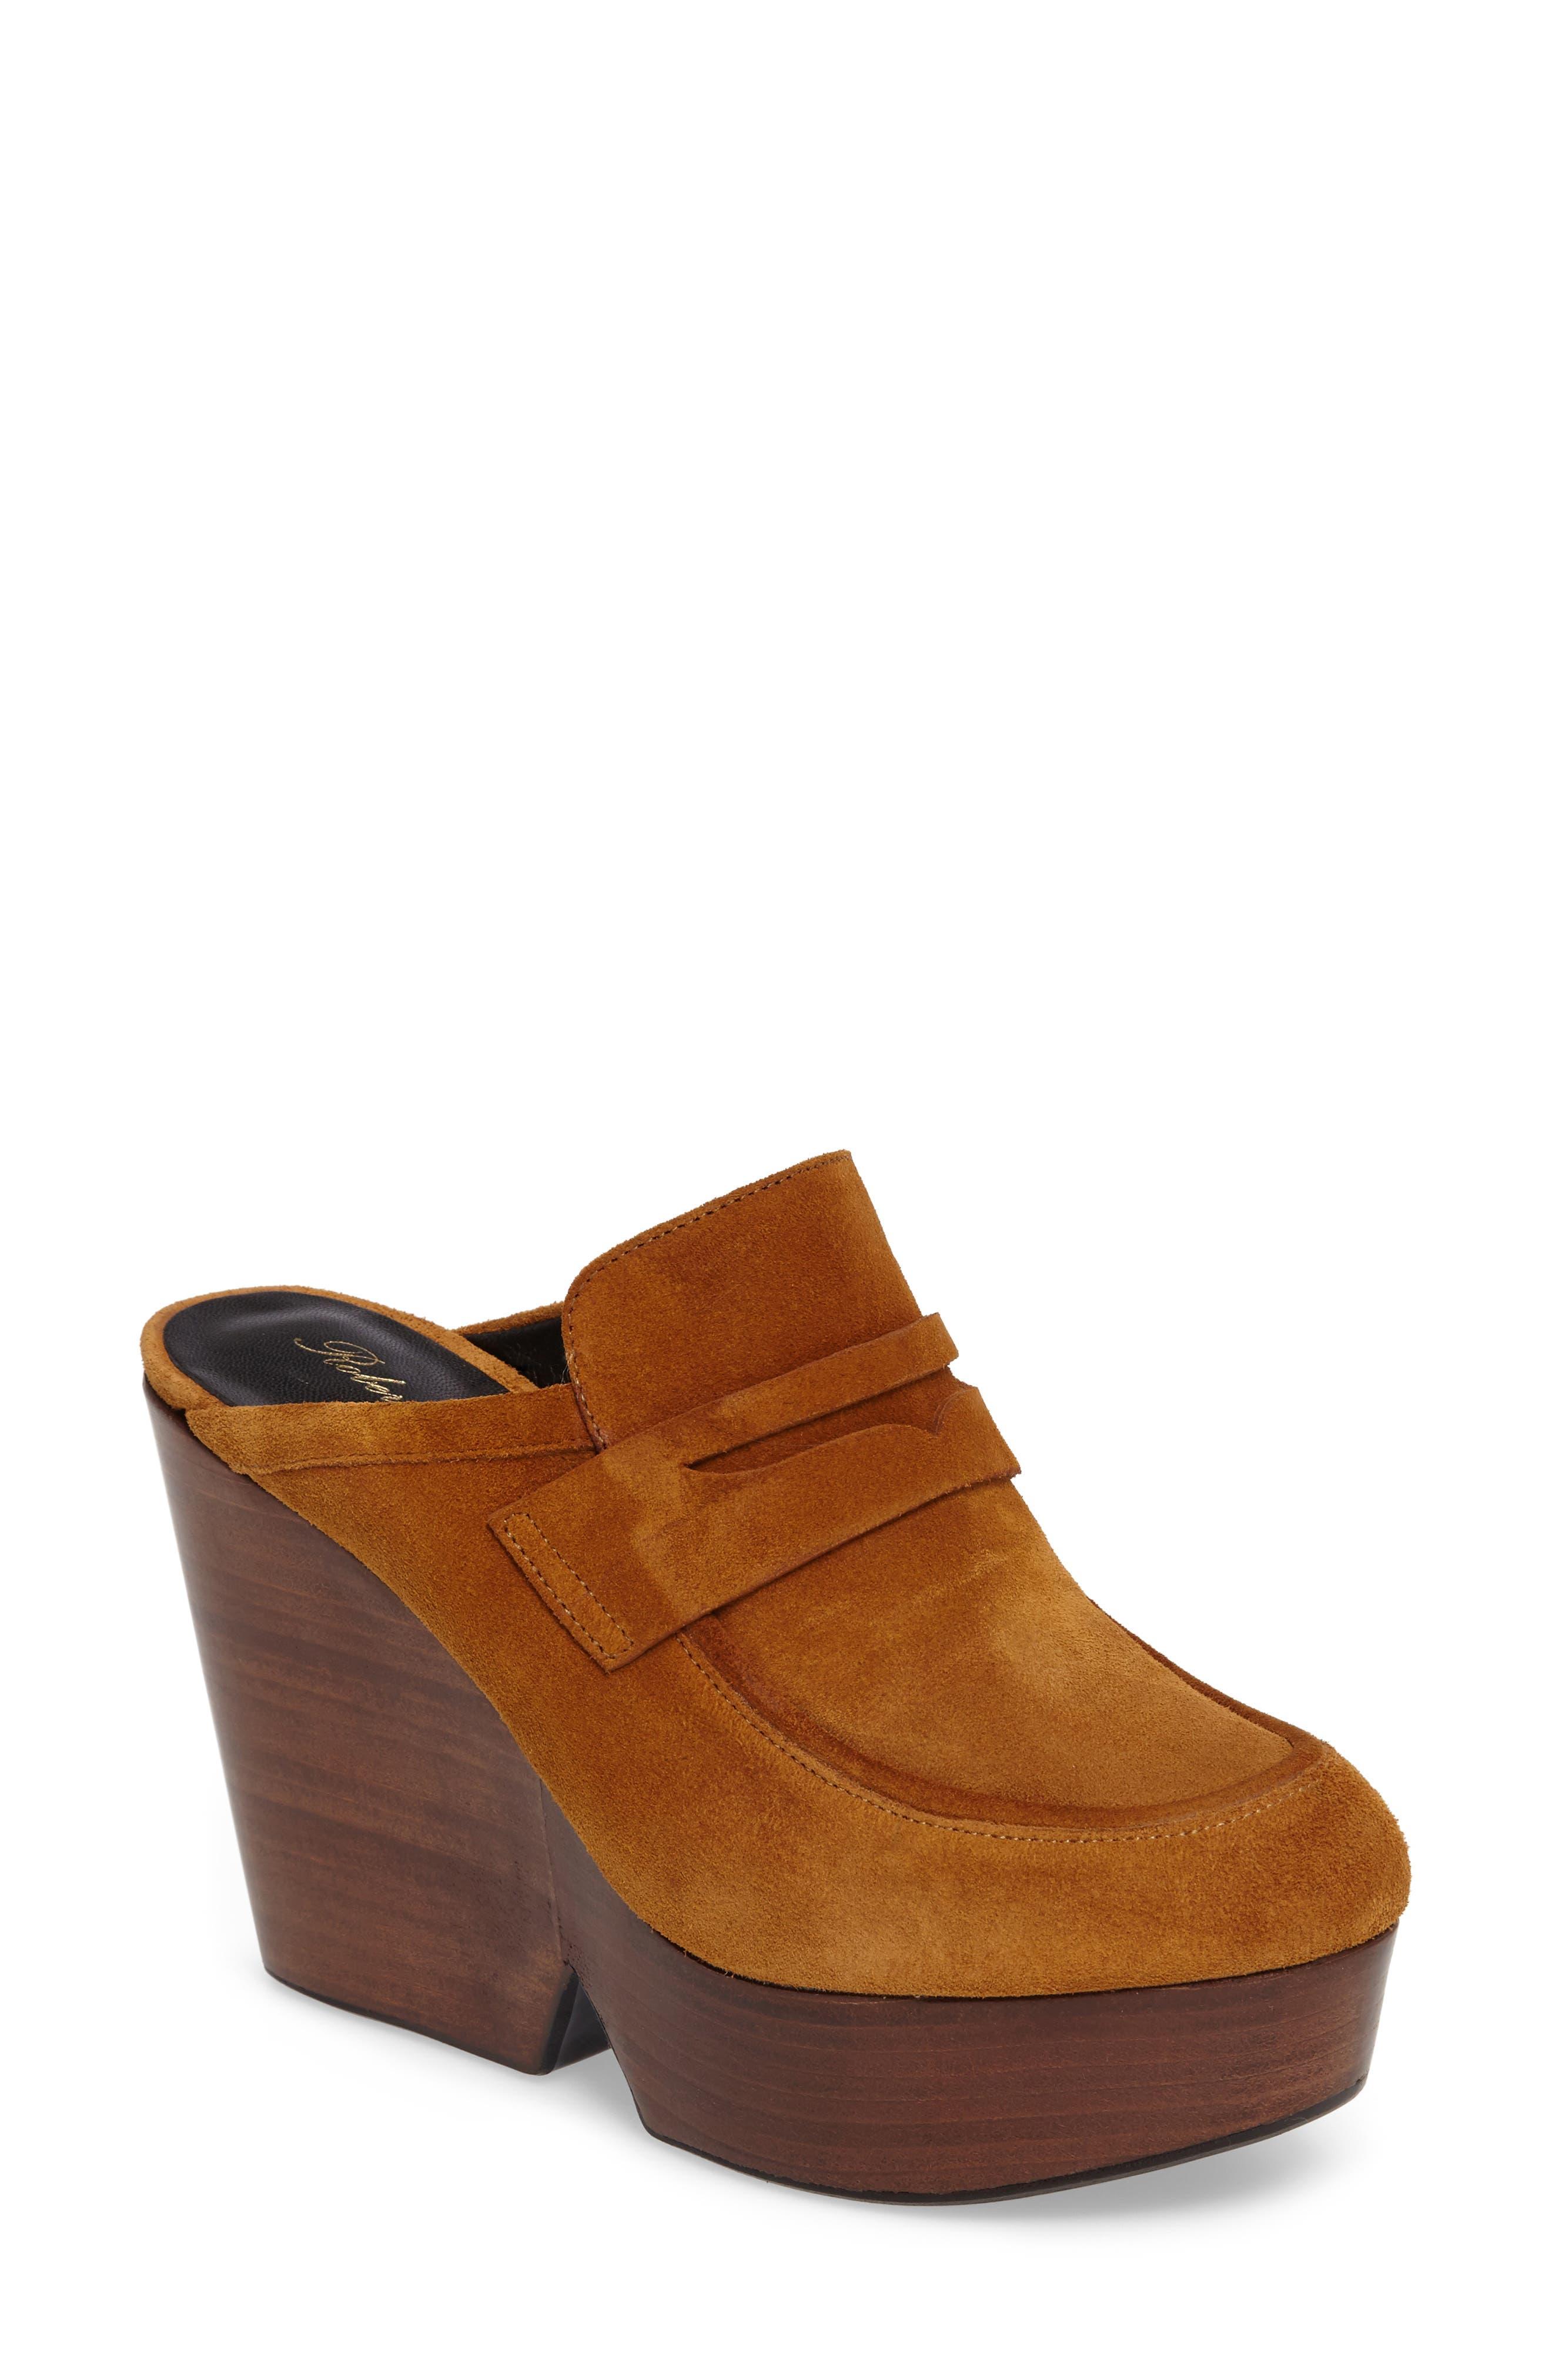 Main Image - Robert Clergerie Damor Platform Loafer Mule (Women)